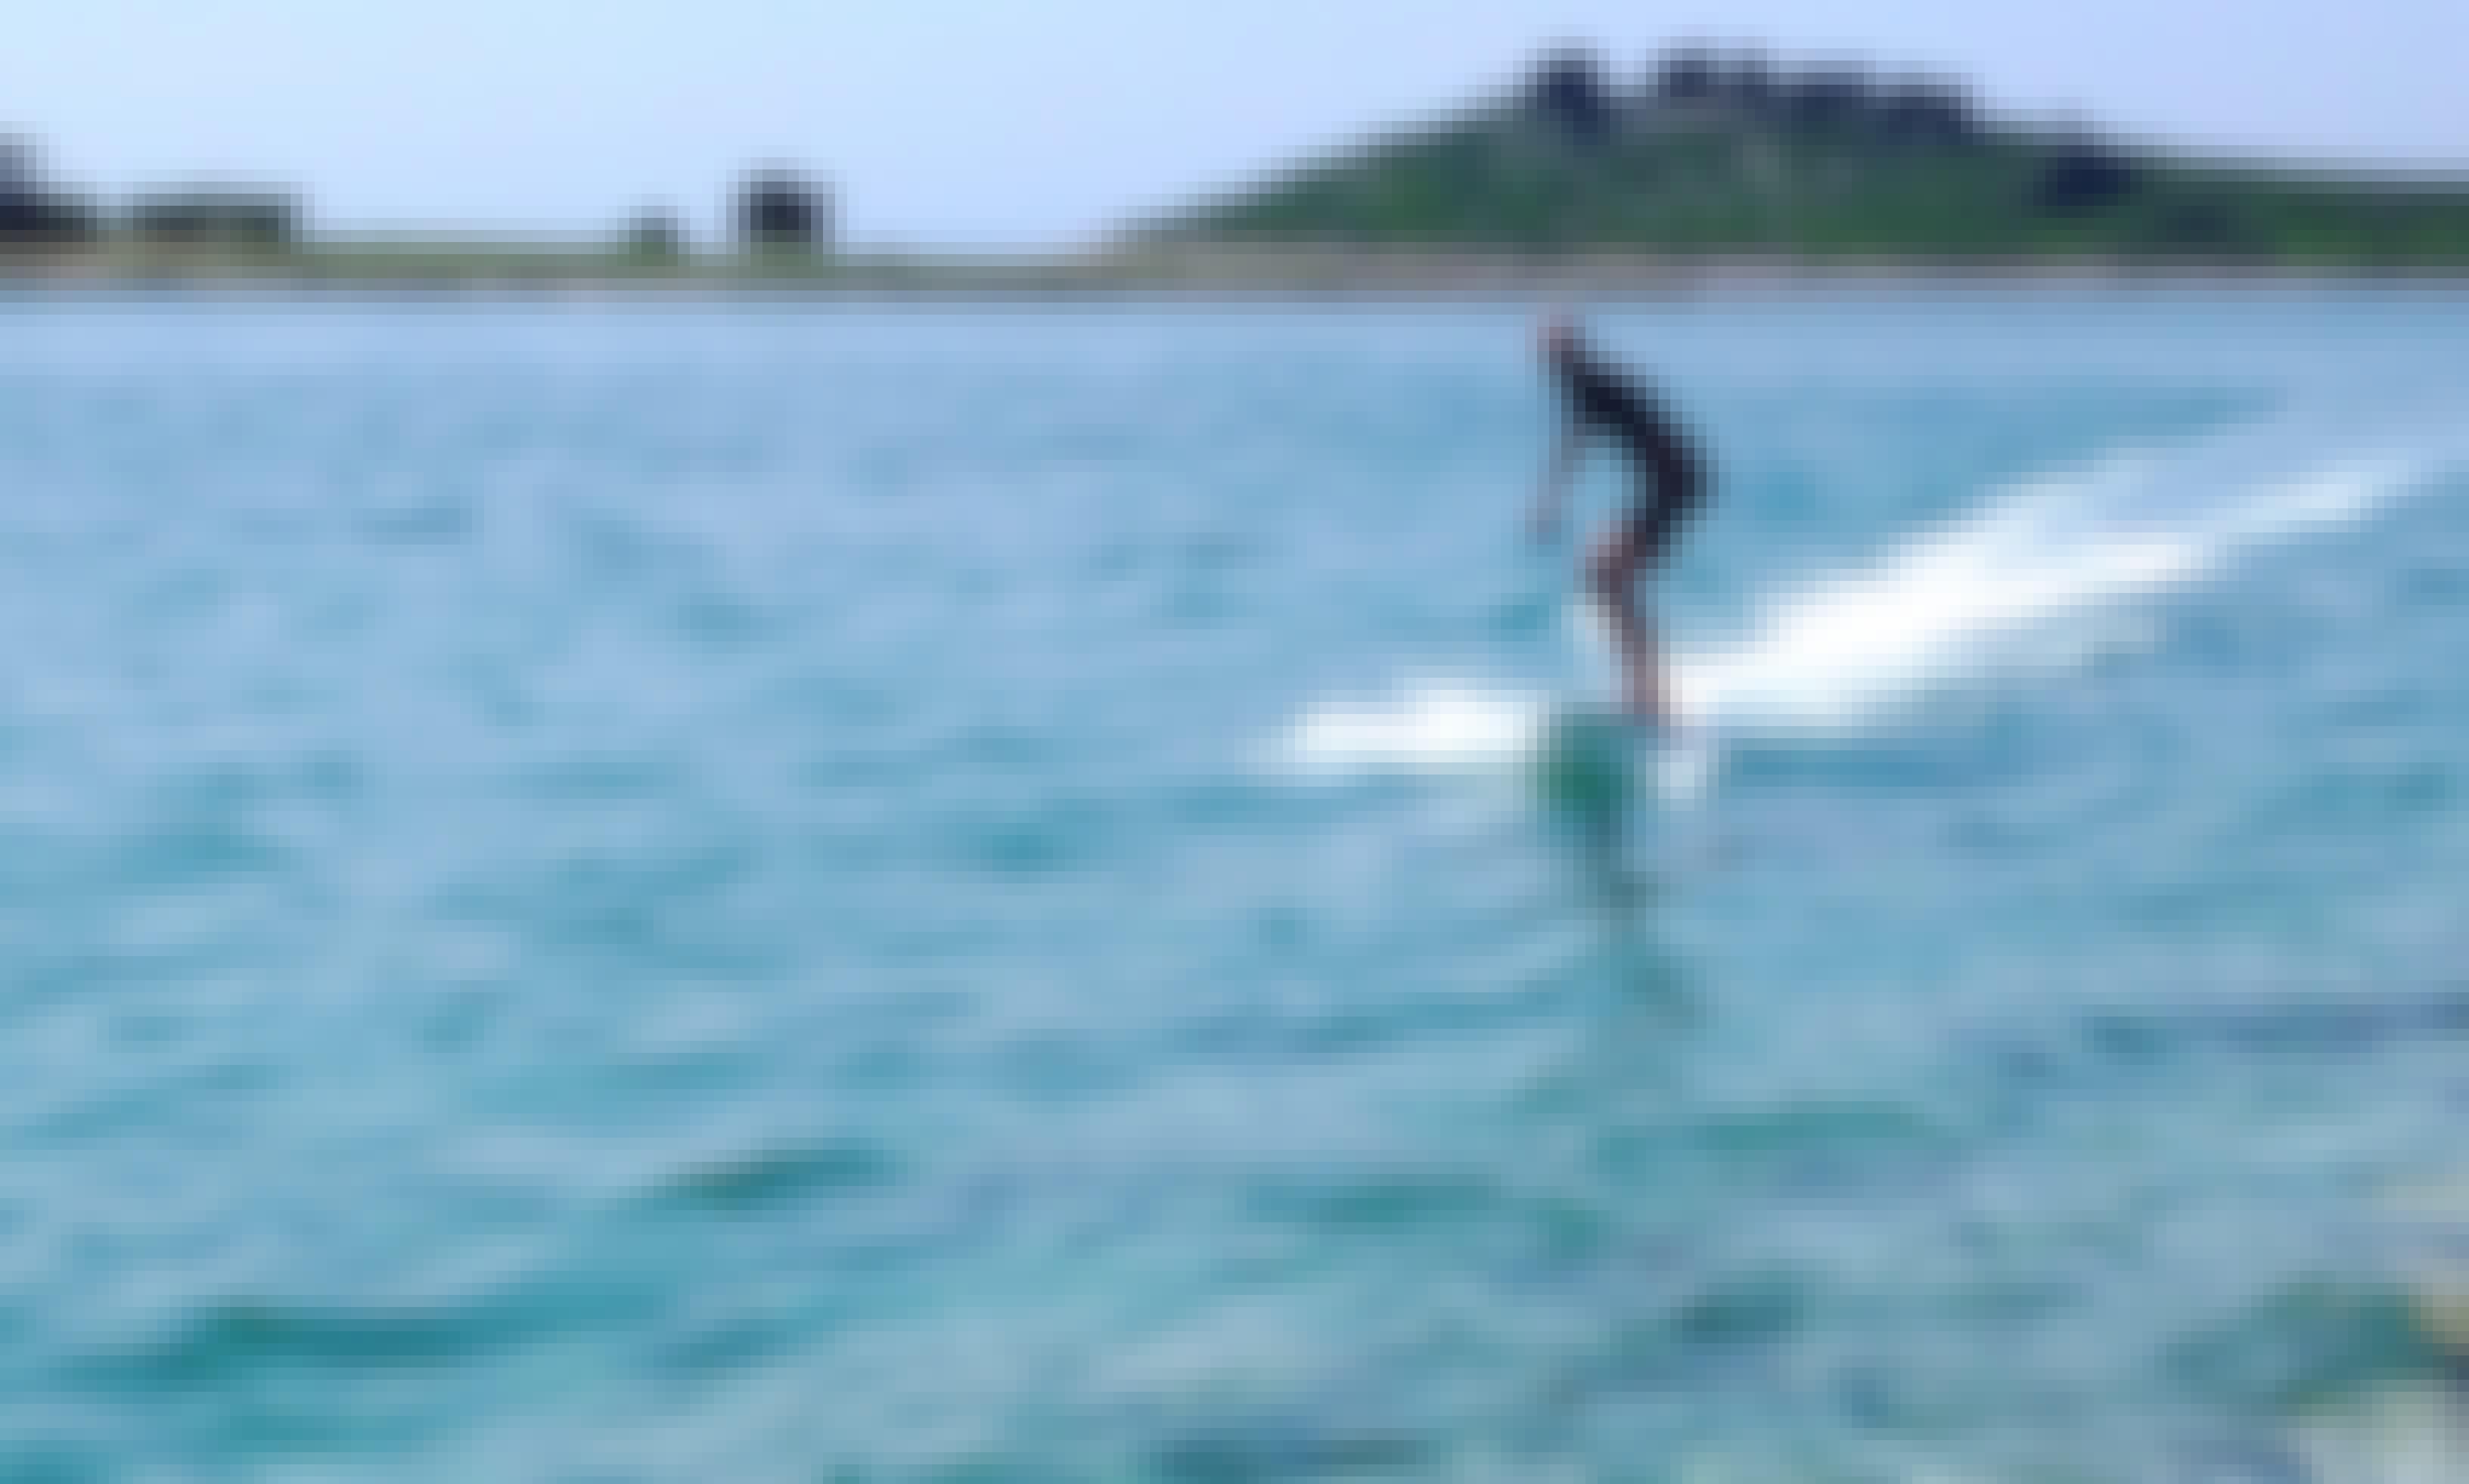 Electric surfboard for rent in Zadar, Croatia (SURFER_hr by Poletusa)